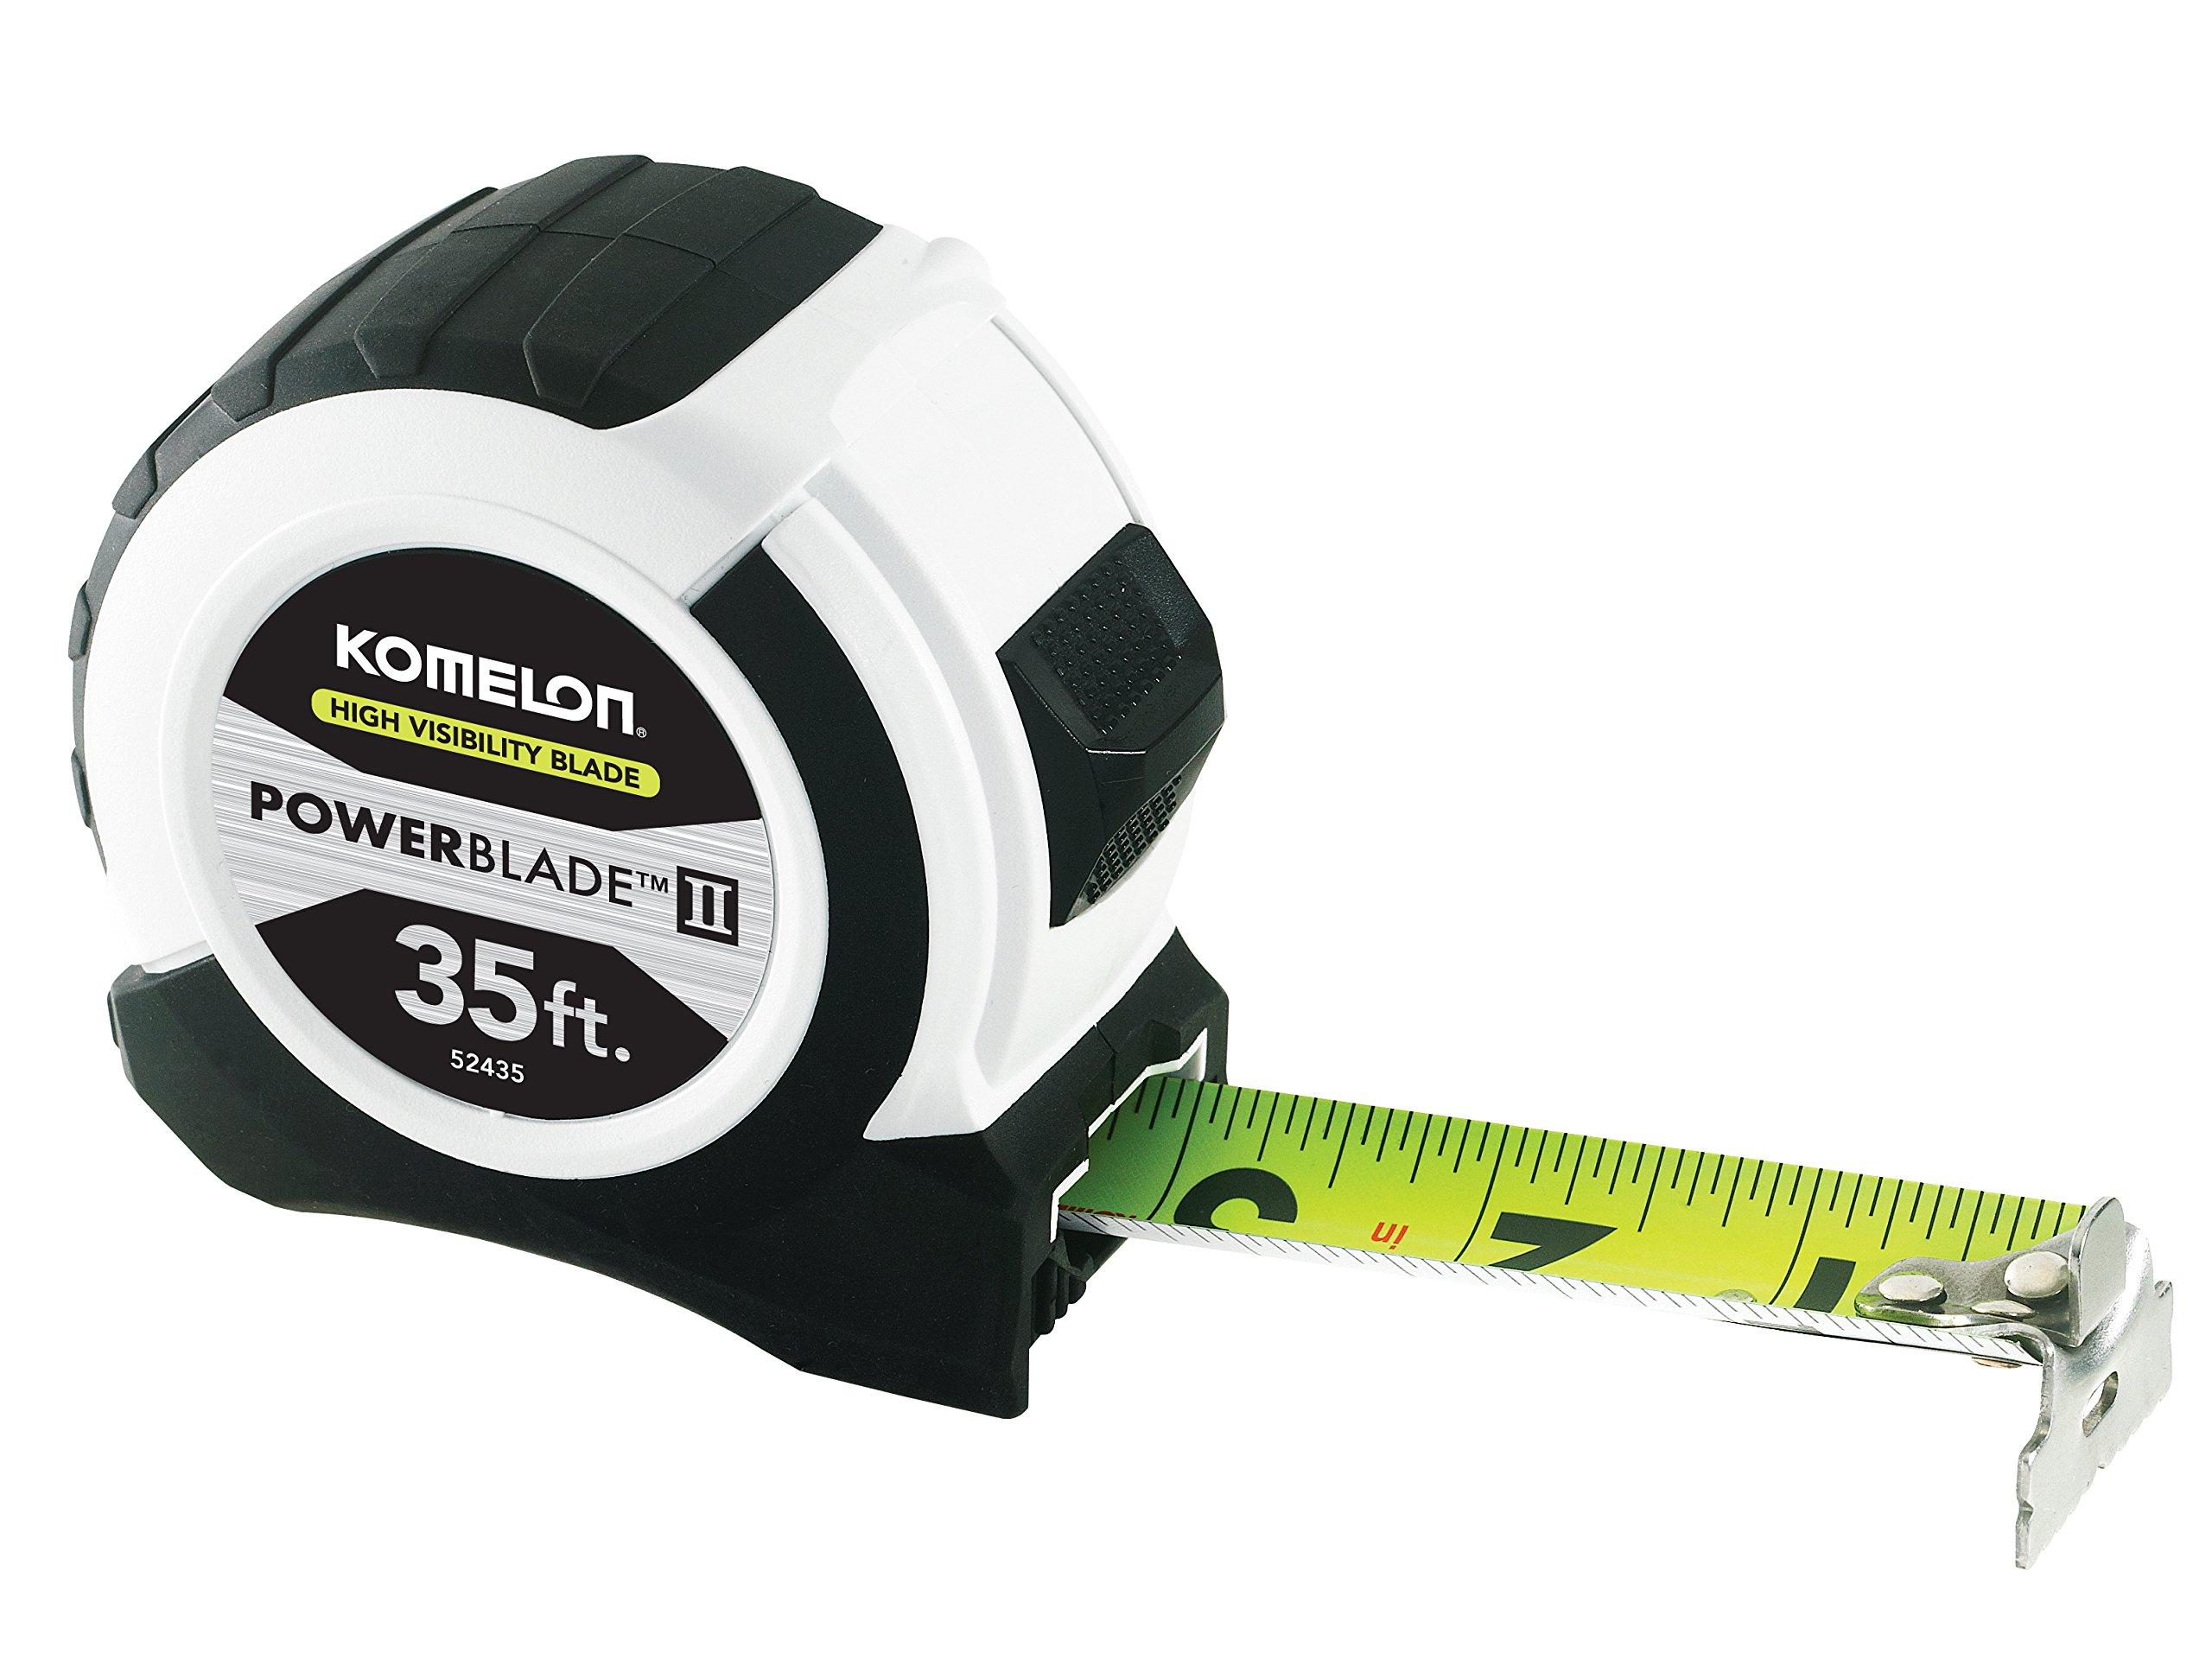 Komelon 52435 Powerblade II Tape Measures, Small, White/Black